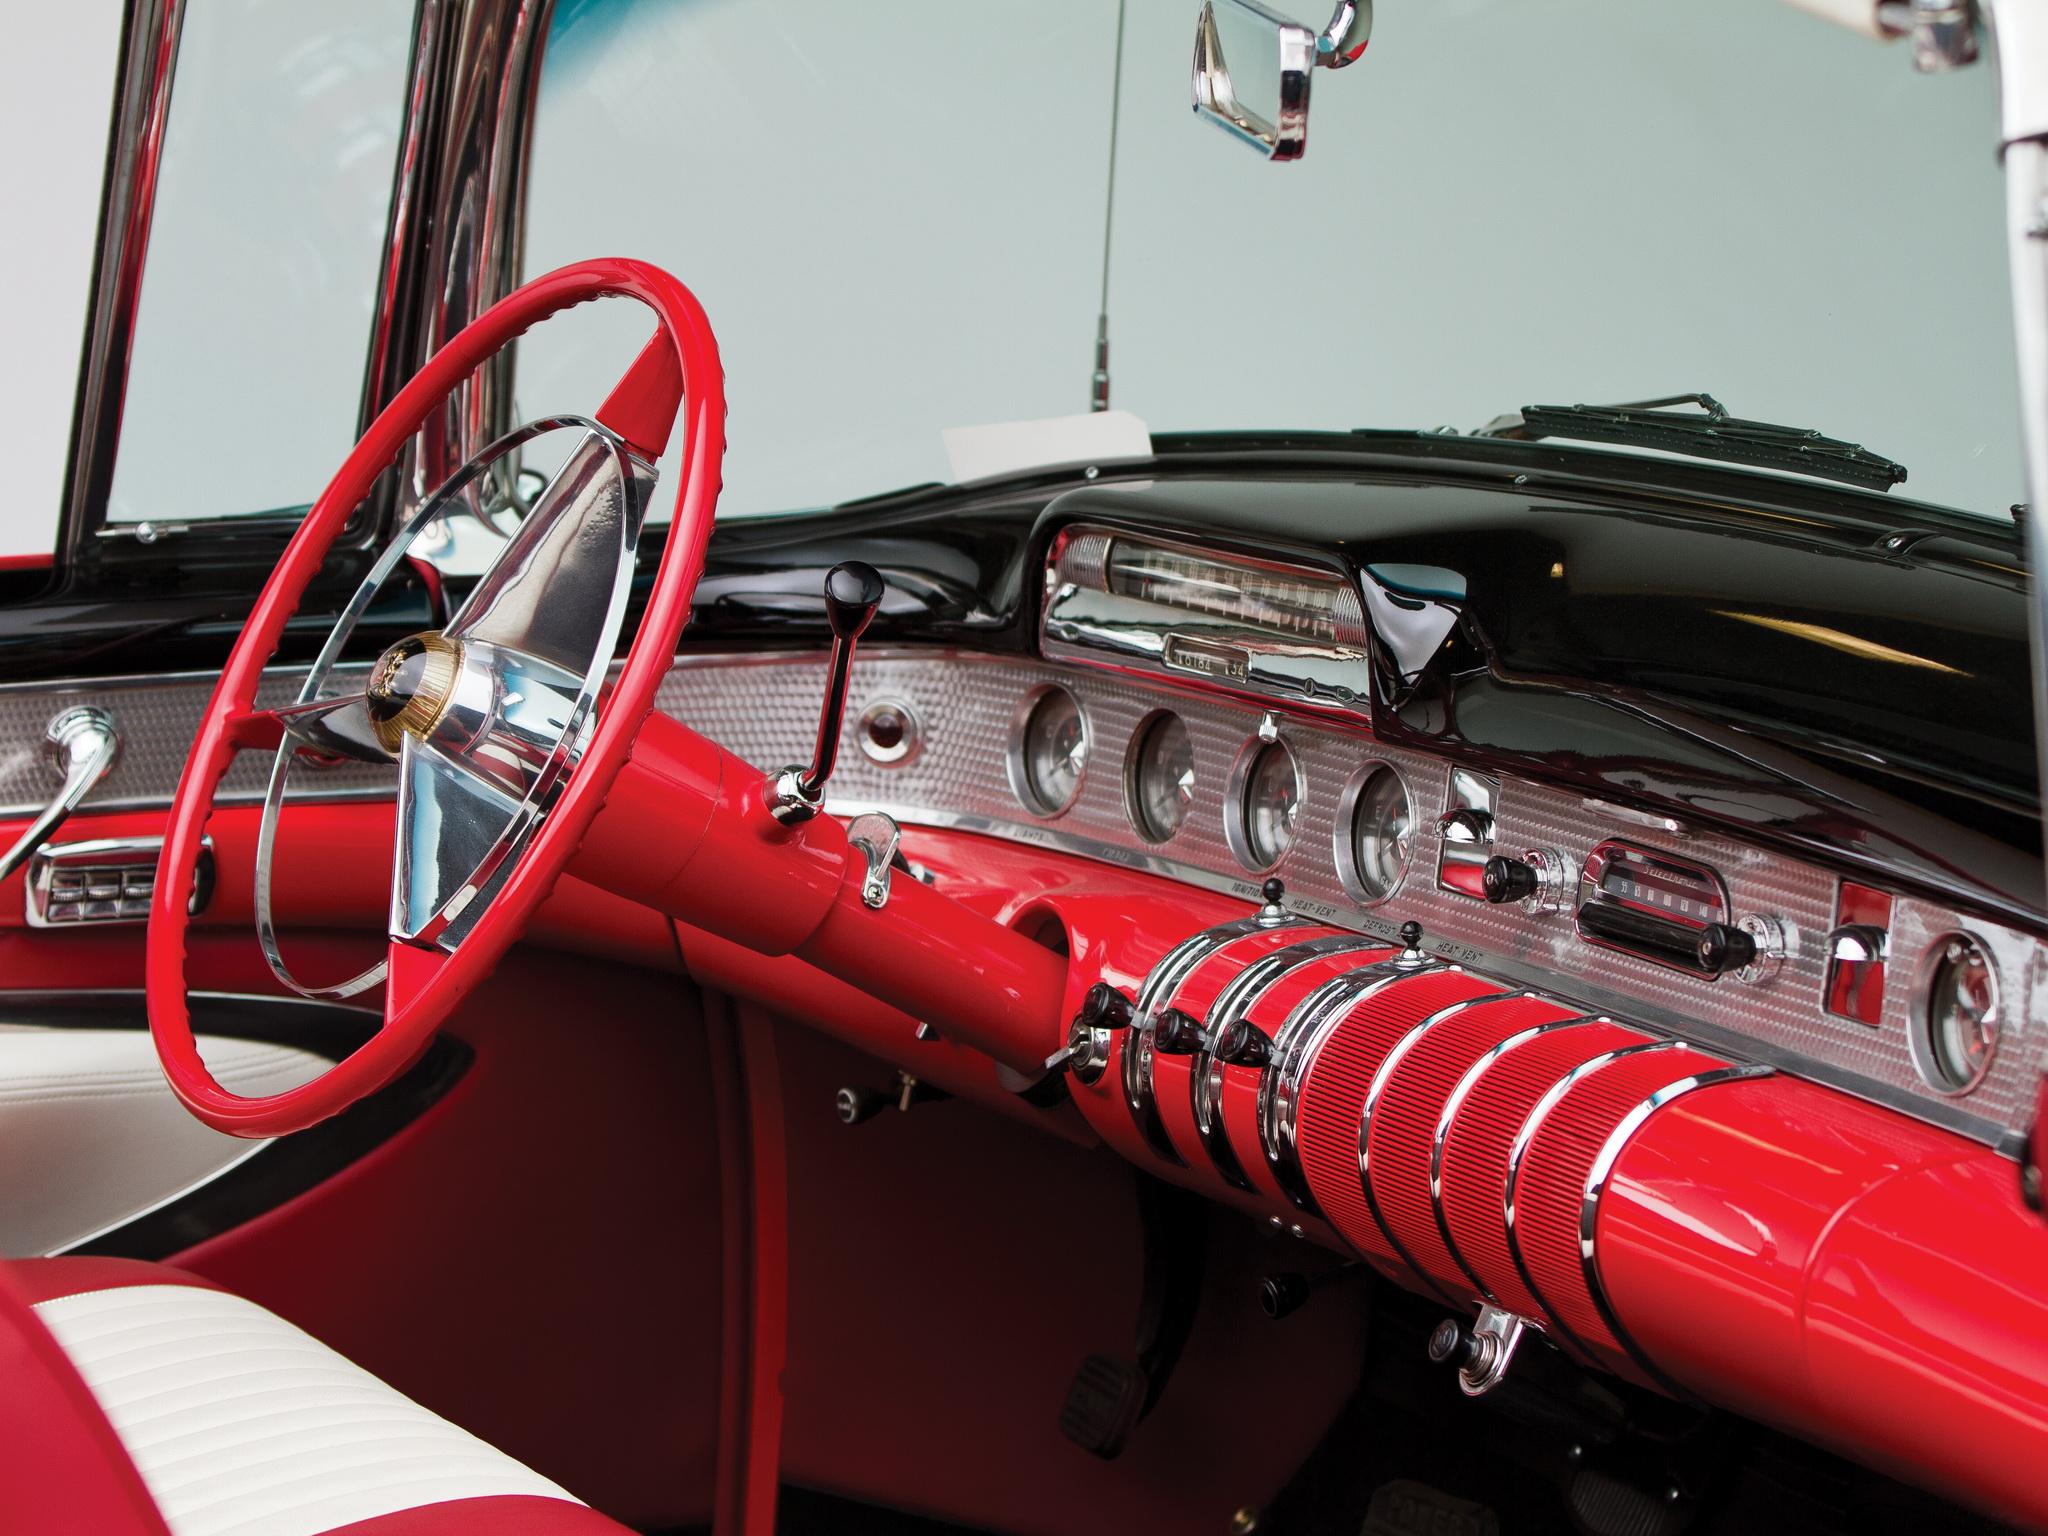 1955 buick roadmaster convertible retro luxury interior r wallpaper 2048x1536 164432 wallpaperup